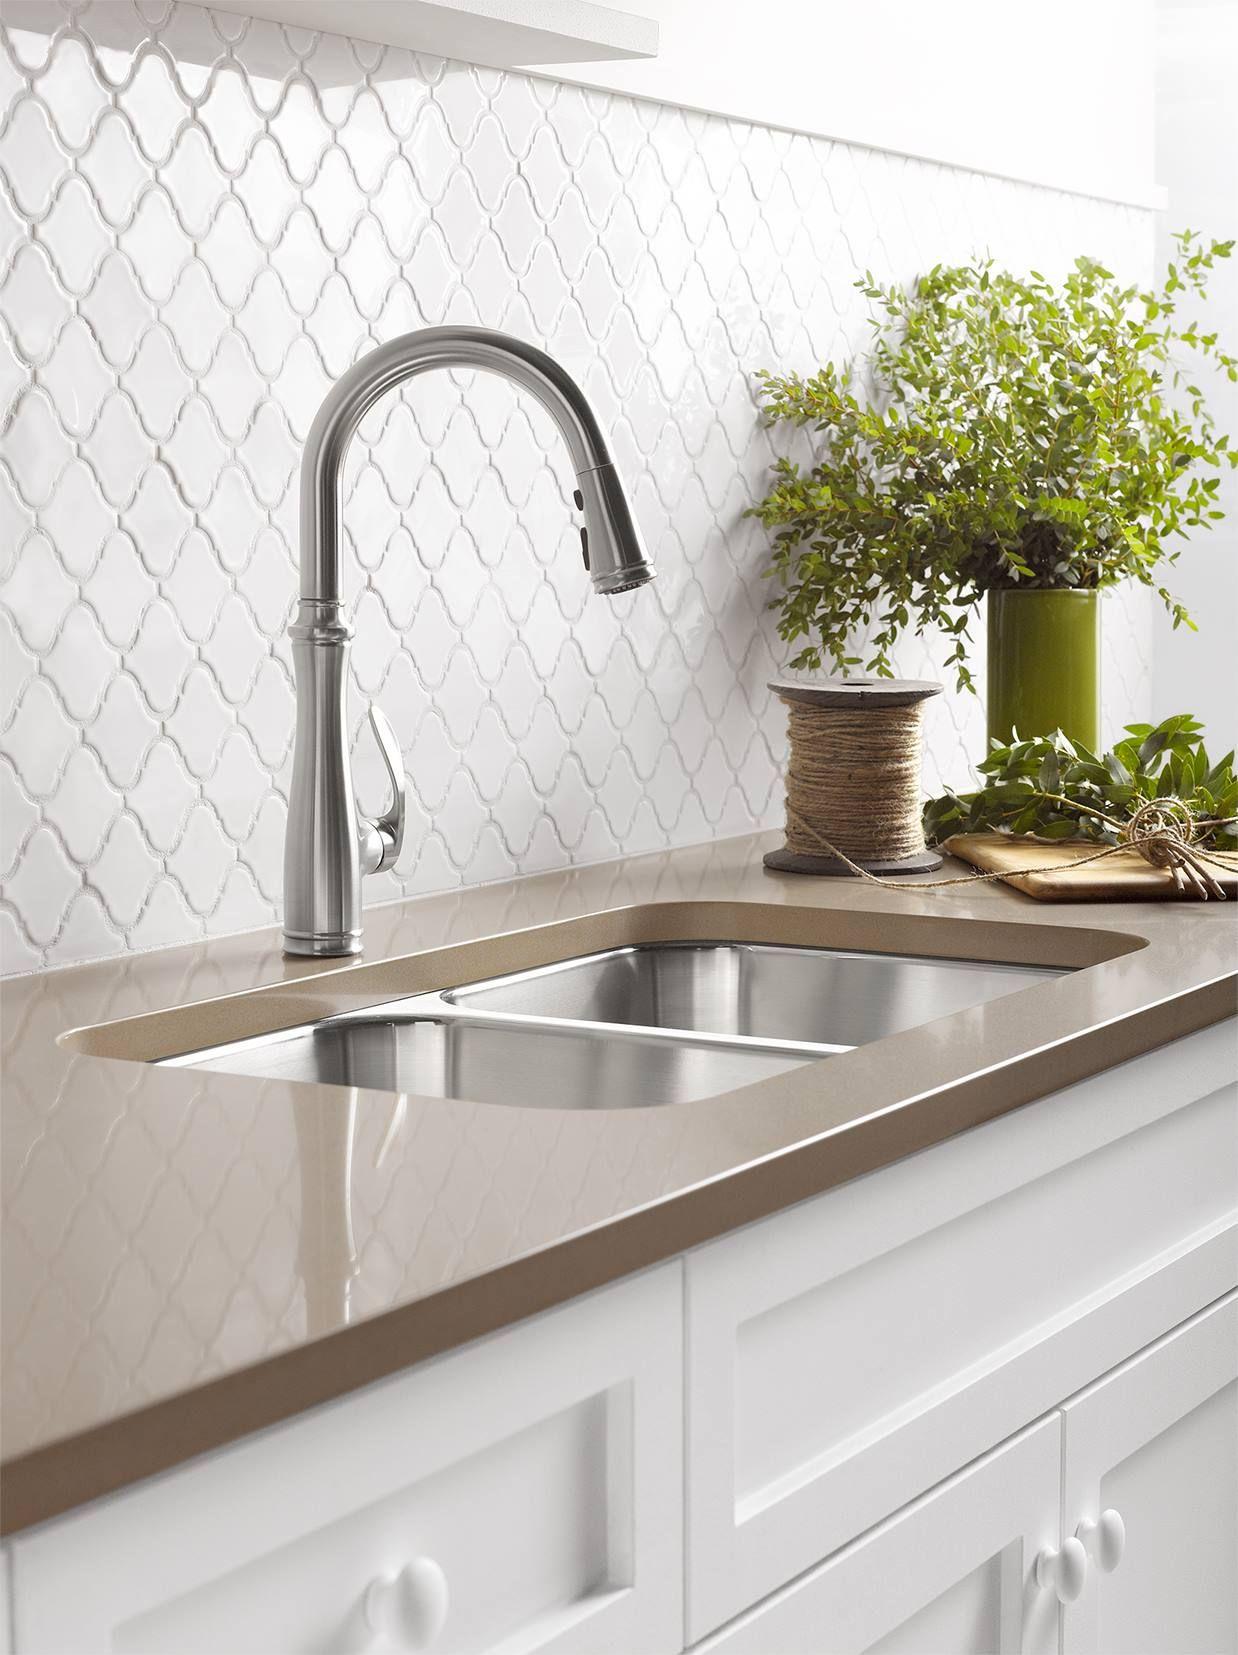 Kohler Bellera Kitchen Faucet Kitchen Sink Design Modern